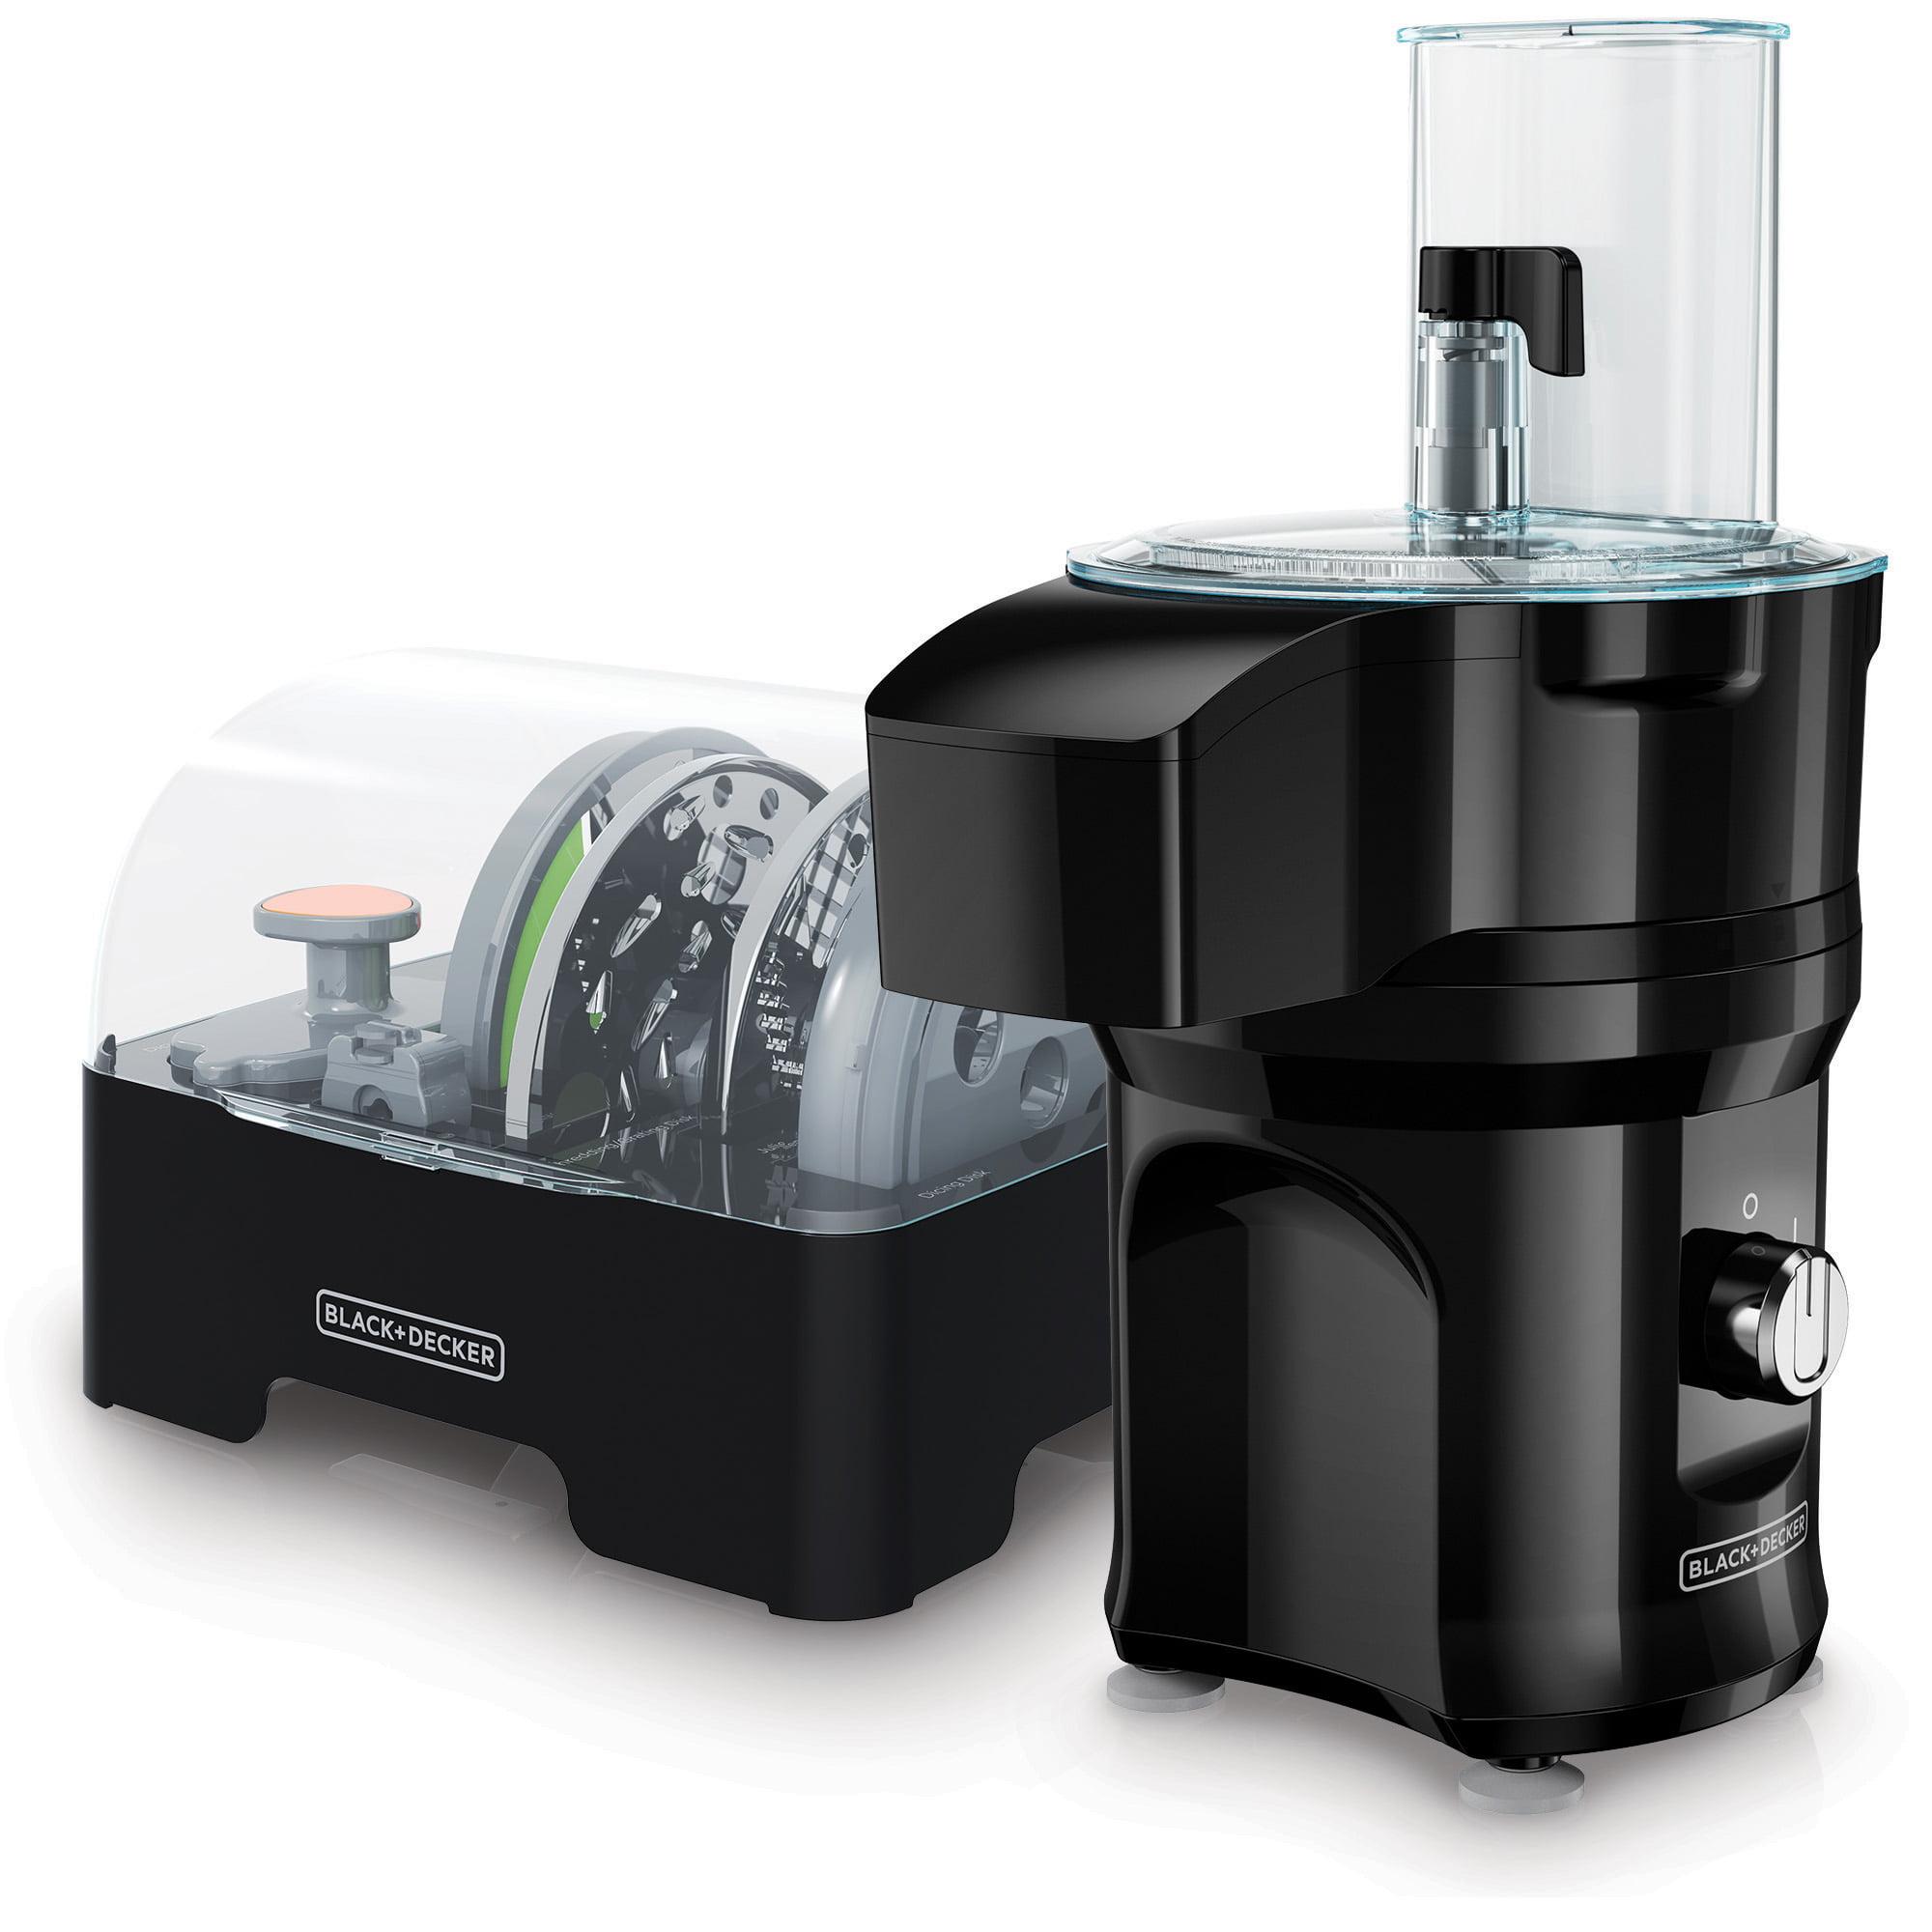 All In One Kitchen Appliance.Black Decker Multiprep Slice N Dice All In One Cutting Appliance Black Sl3000b